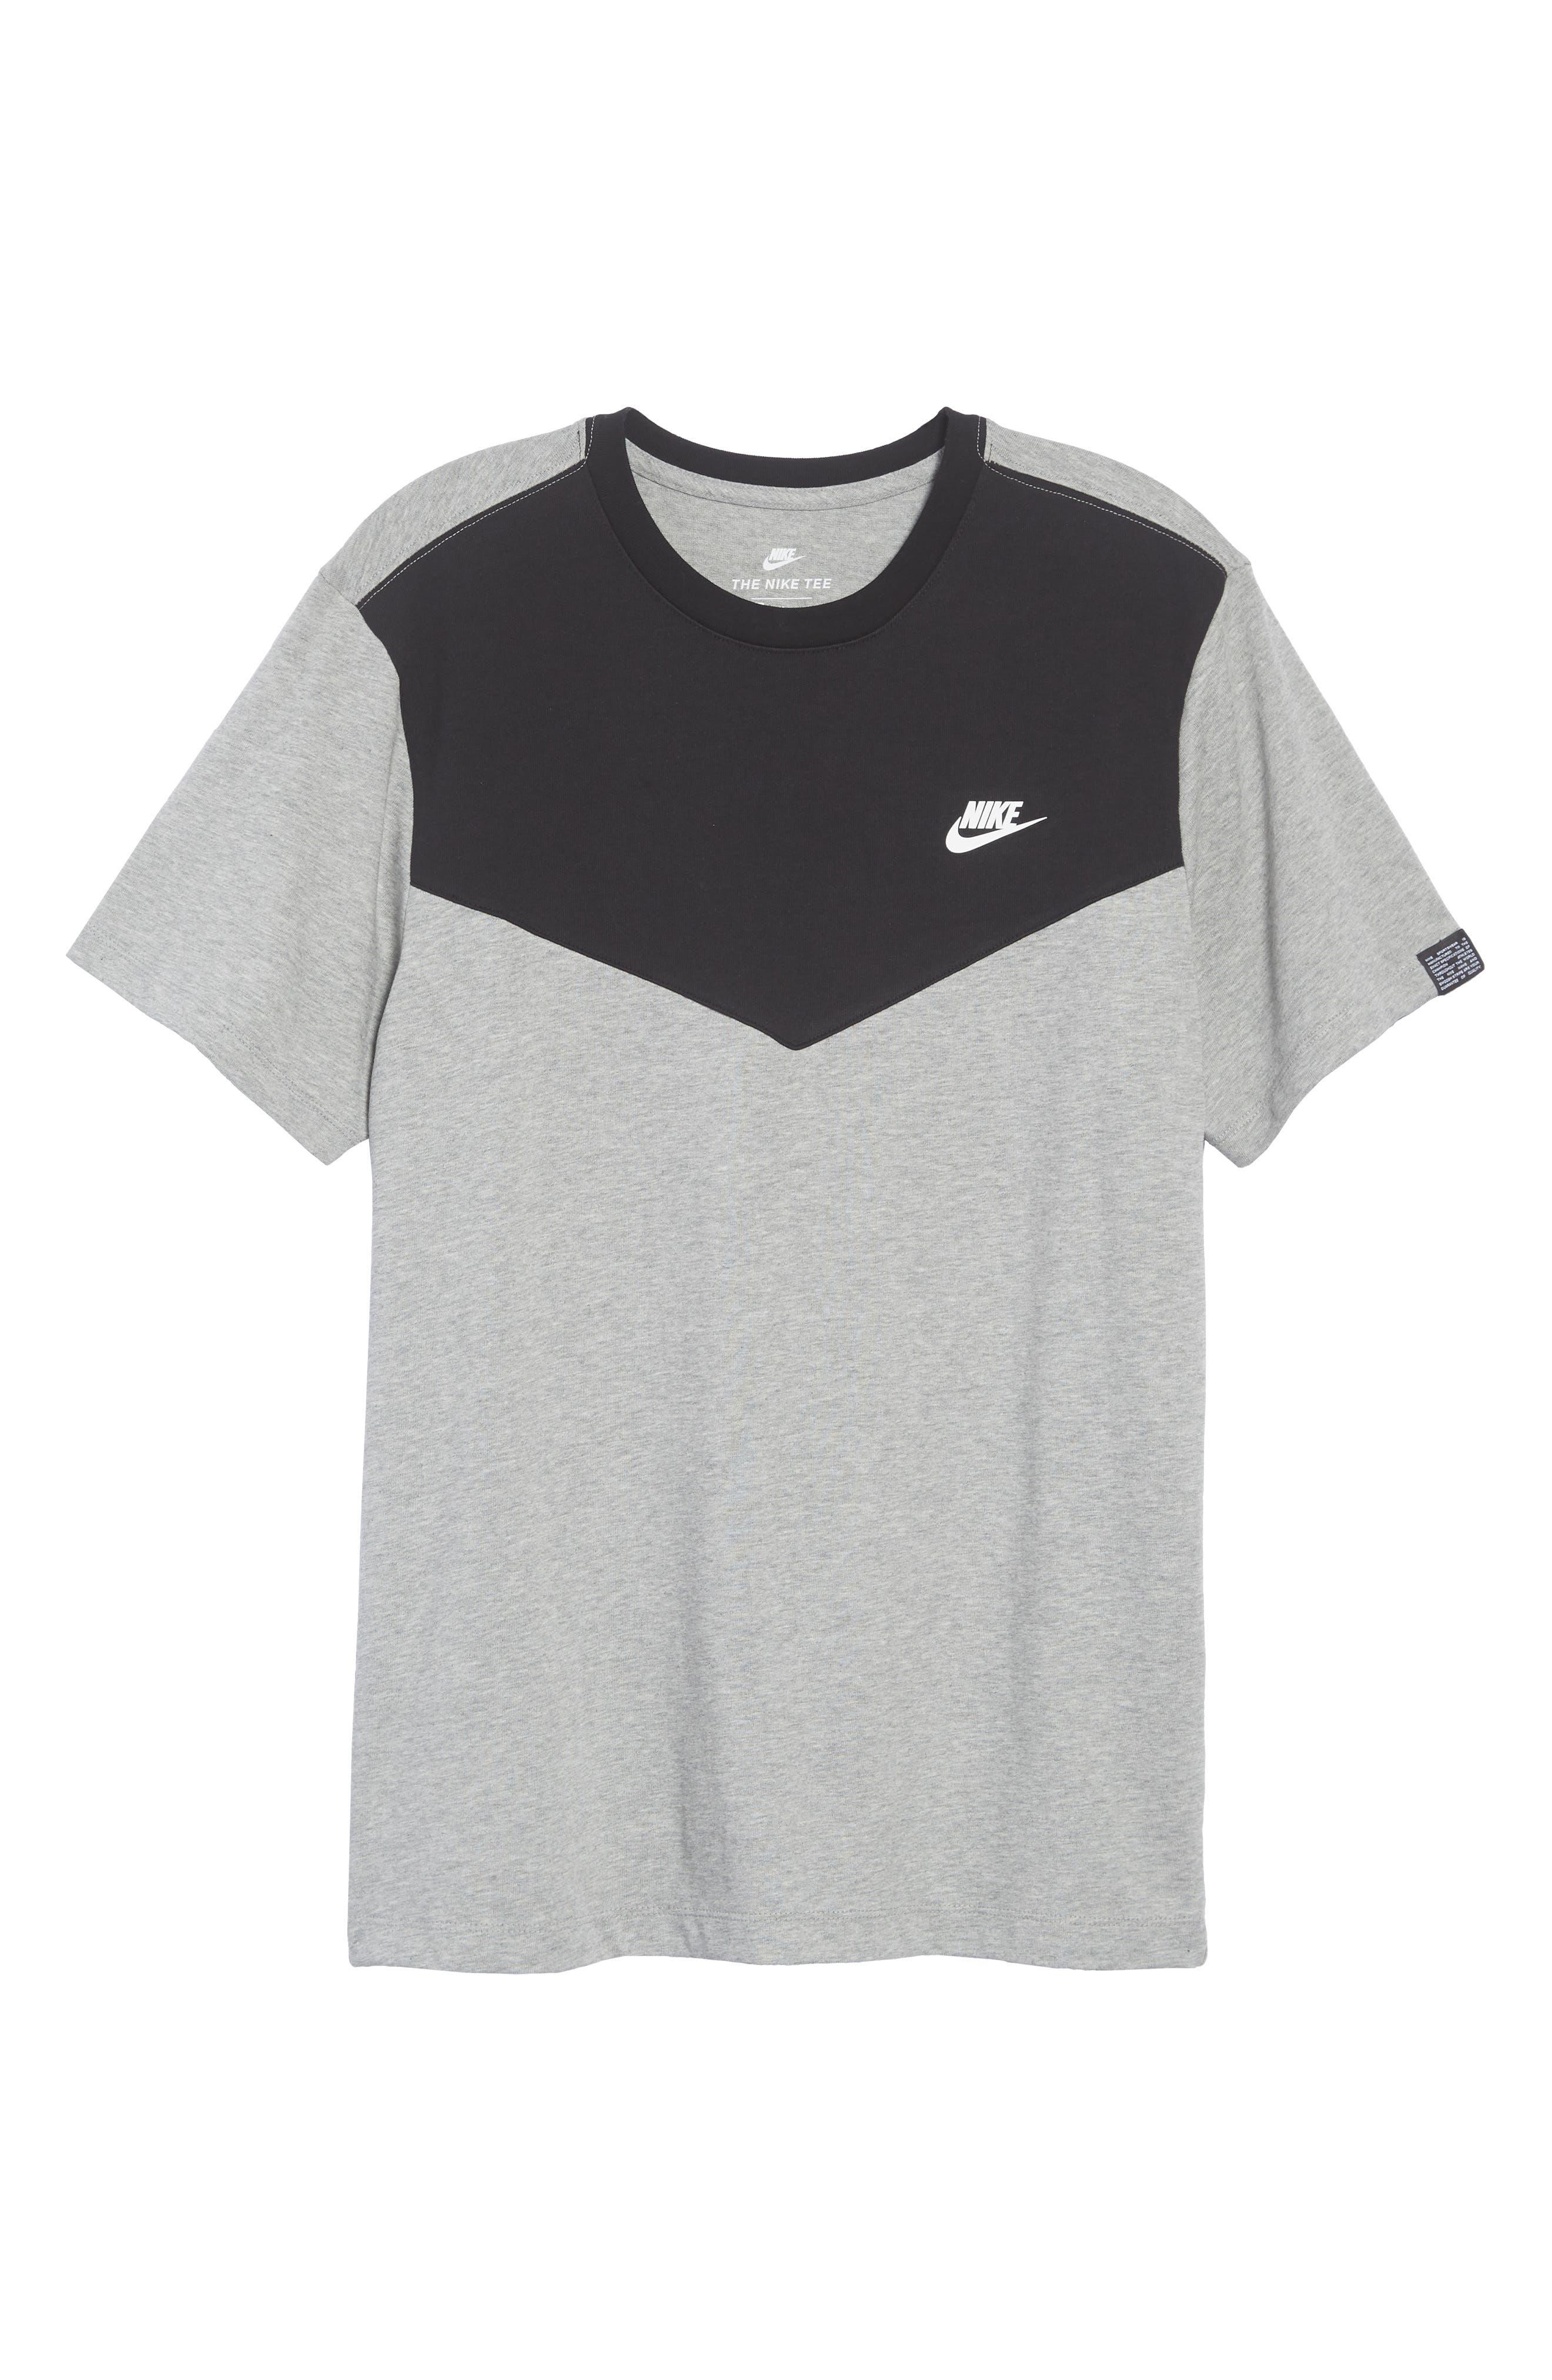 Windrunner Colorblocked T-Shirt,                             Alternate thumbnail 6, color,                             BLACK/ DK GREY HEATHER/ WHITE